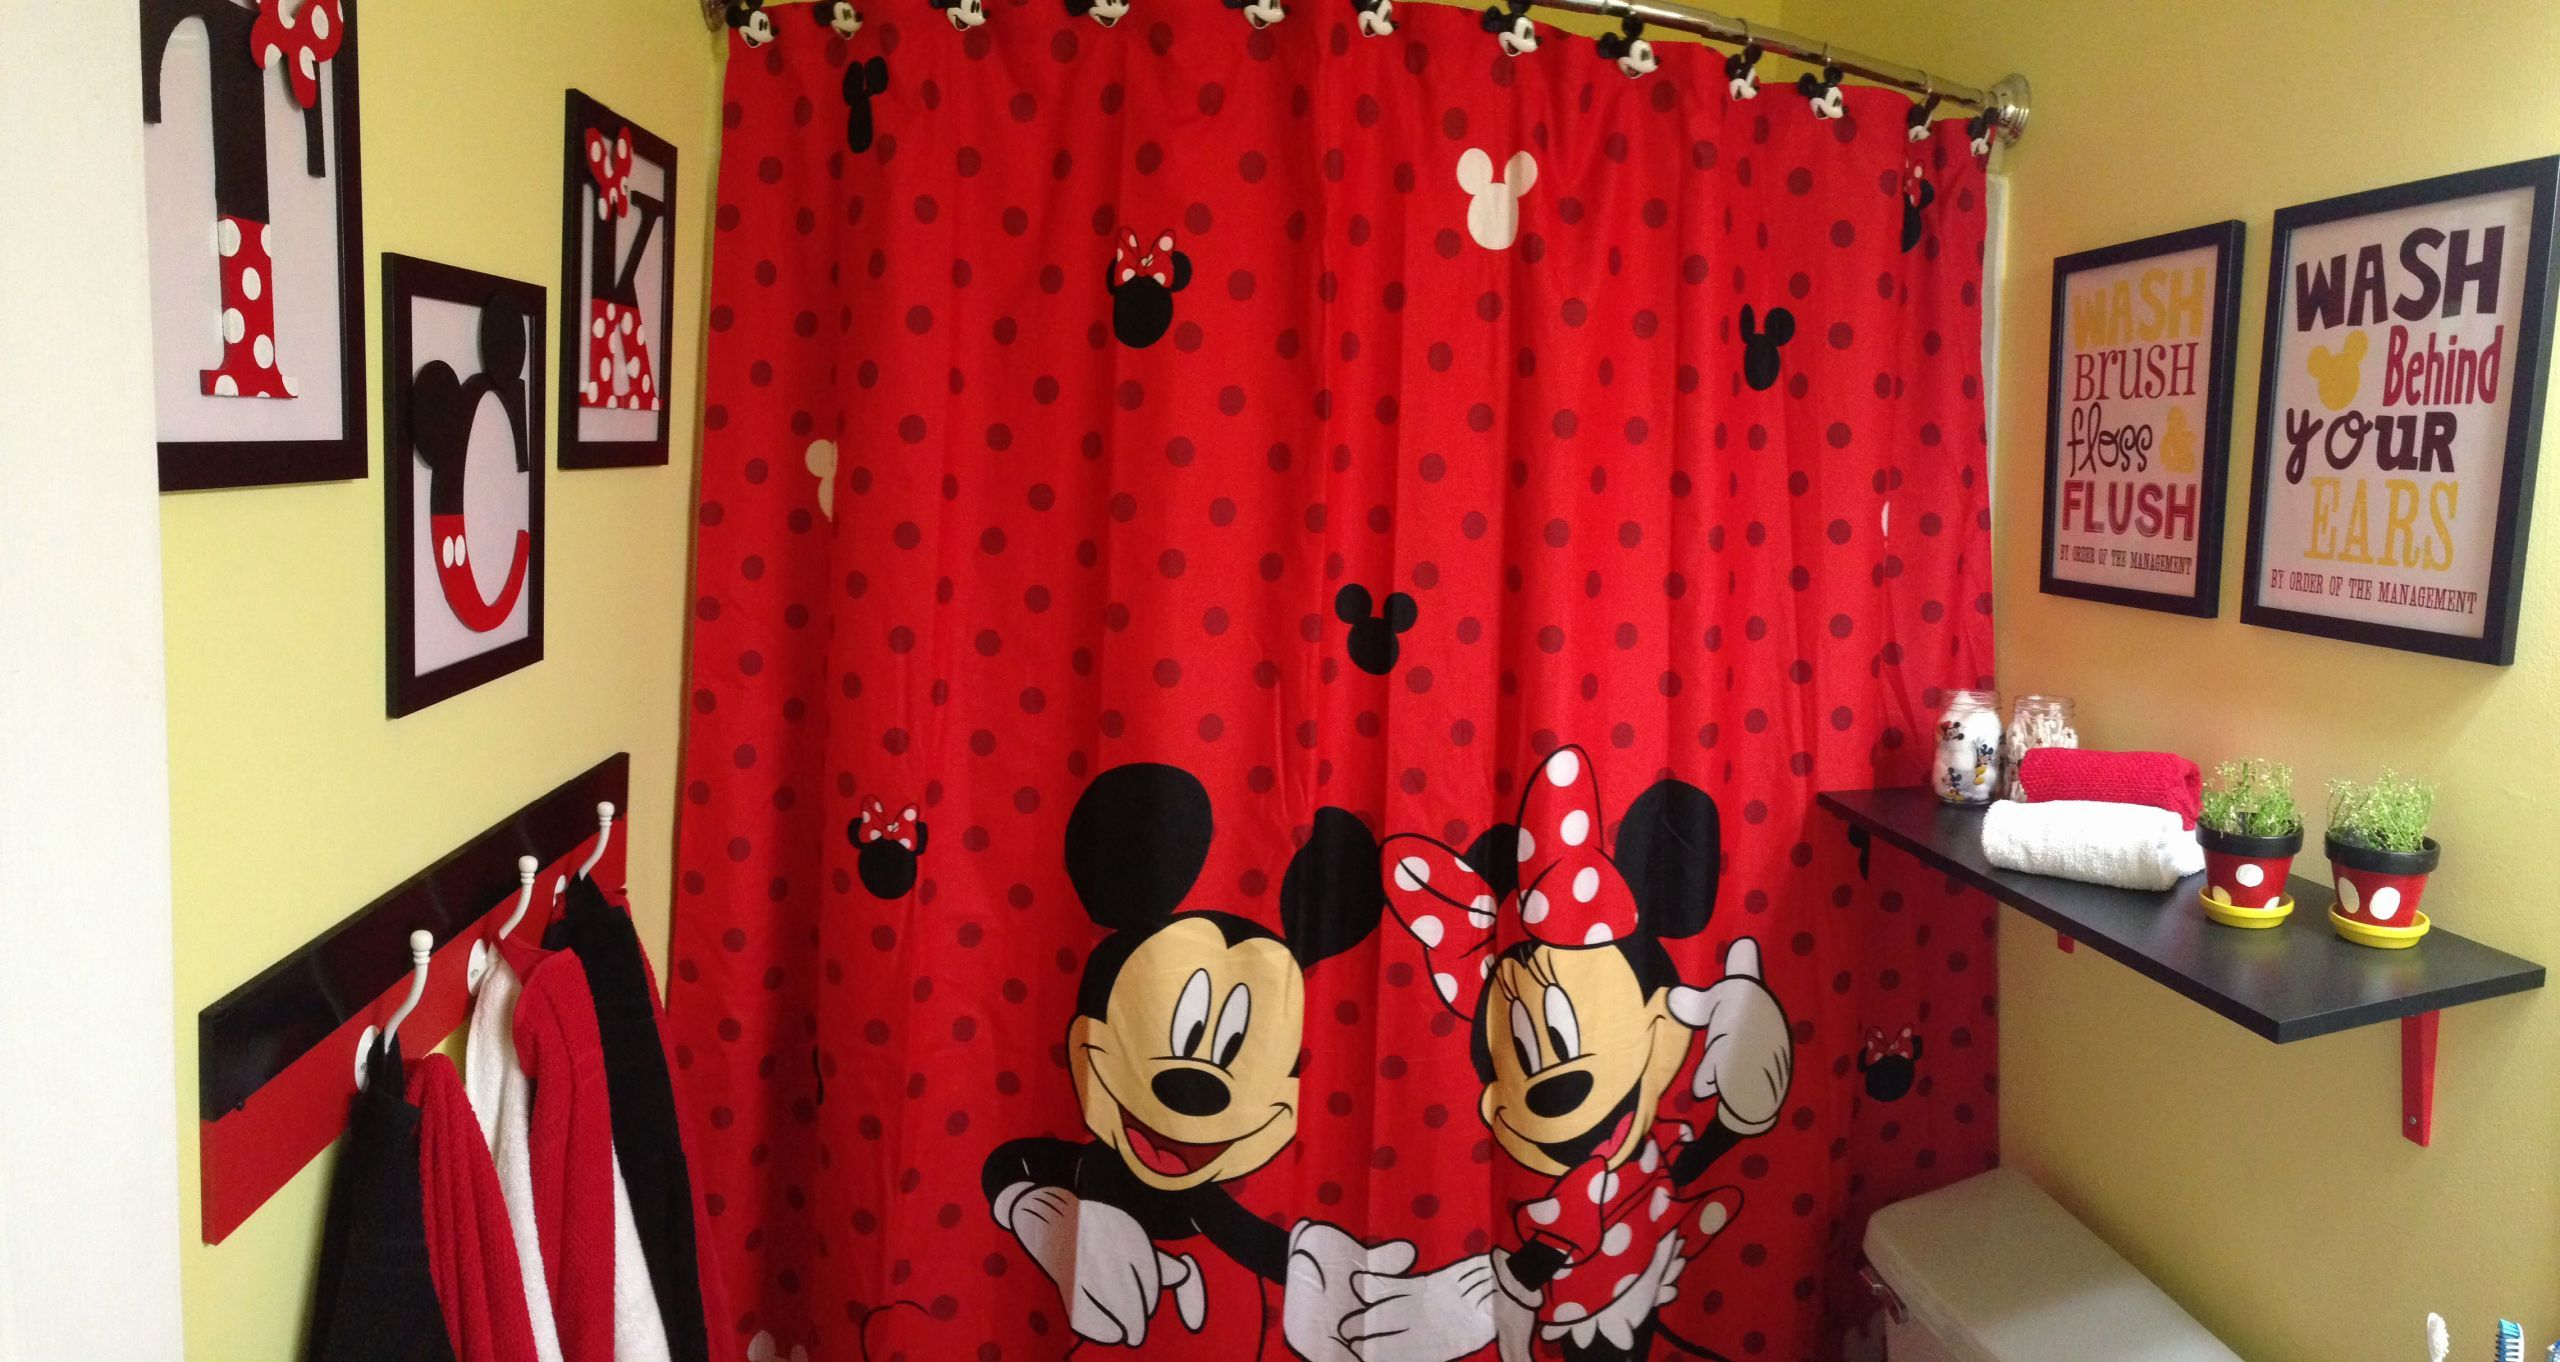 Mickey Mouse Bathroom Ideas Inspirational Mickey Mouse Bathroom Mickey Mouse Disney Bat In 2020 Mickey Mouse Bathroom Minnie Mouse Bathroom Decor Minnie Mouse Bathroom